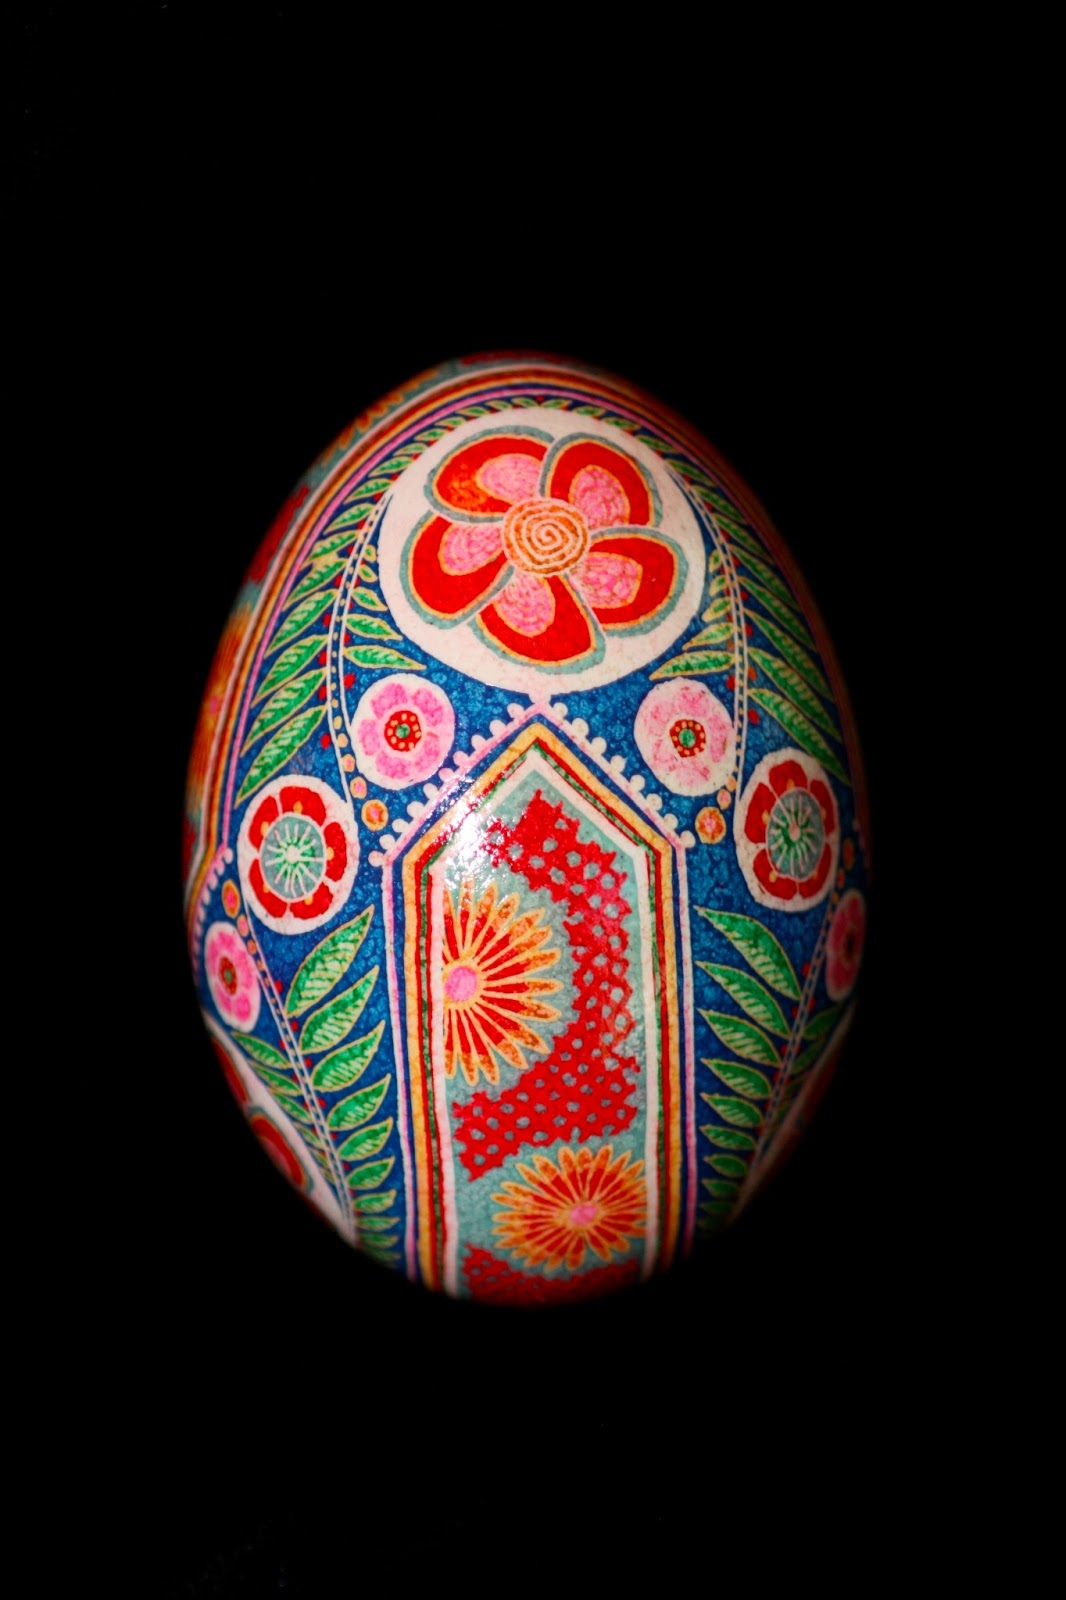 katyegg design  friday egg  like holding hands